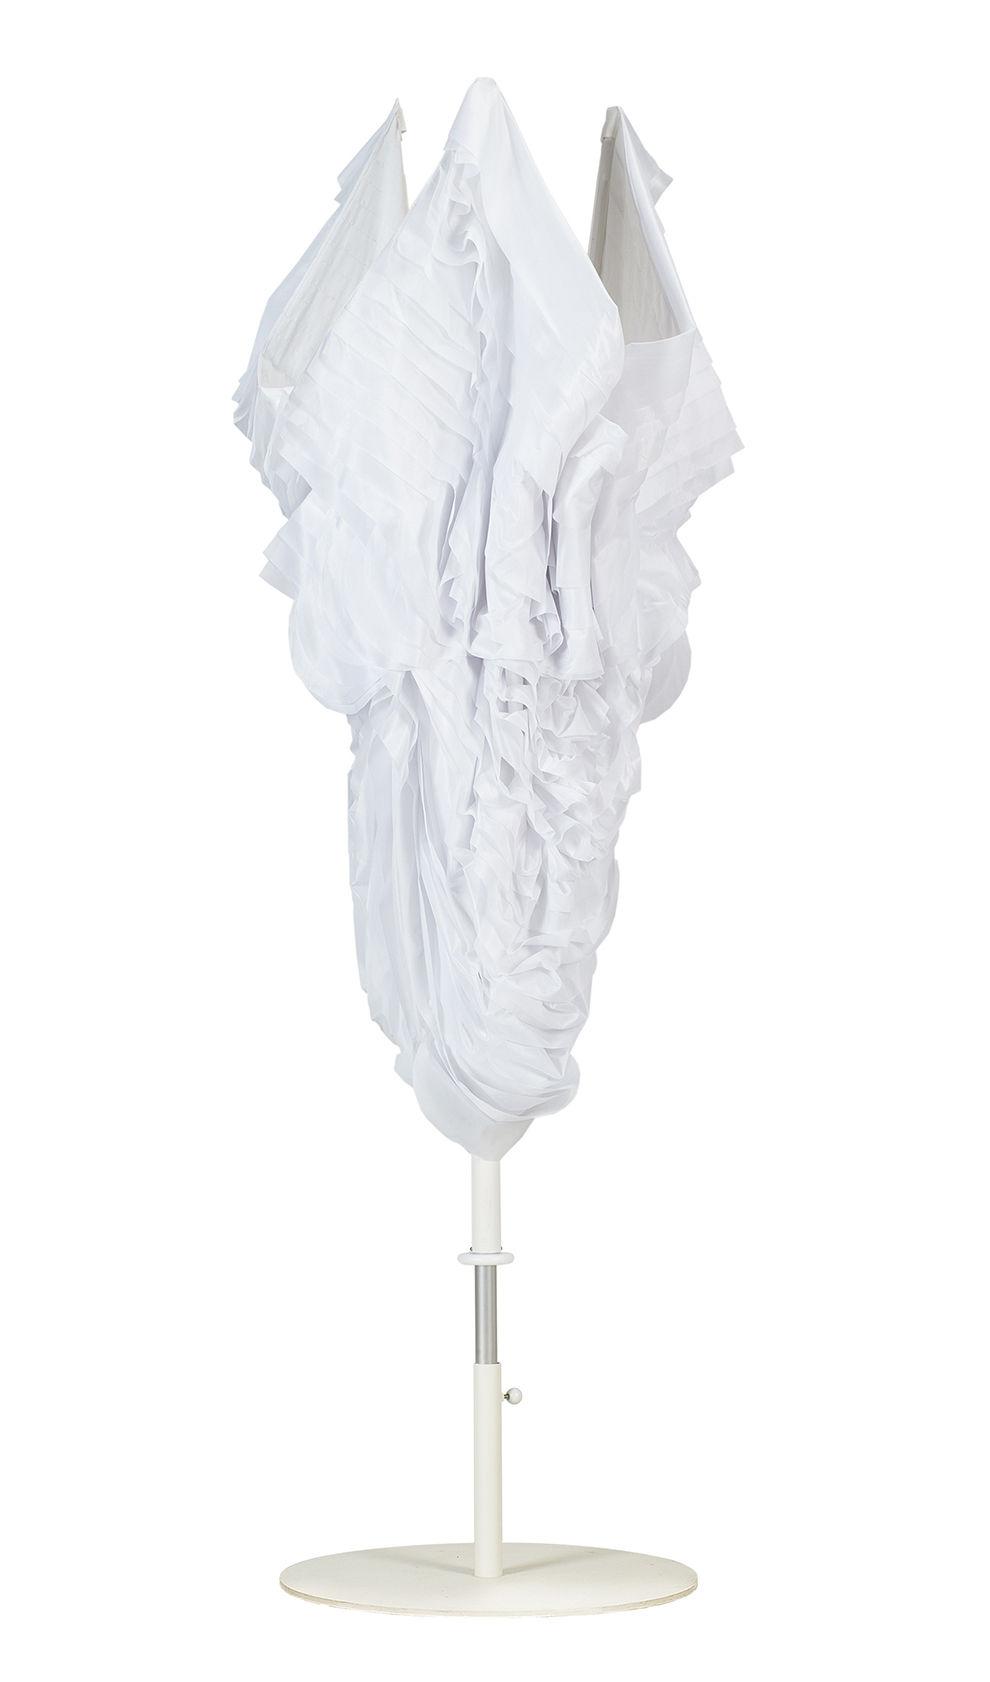 twister parasol 250 x 250 cm blanc by sywawa. Black Bedroom Furniture Sets. Home Design Ideas